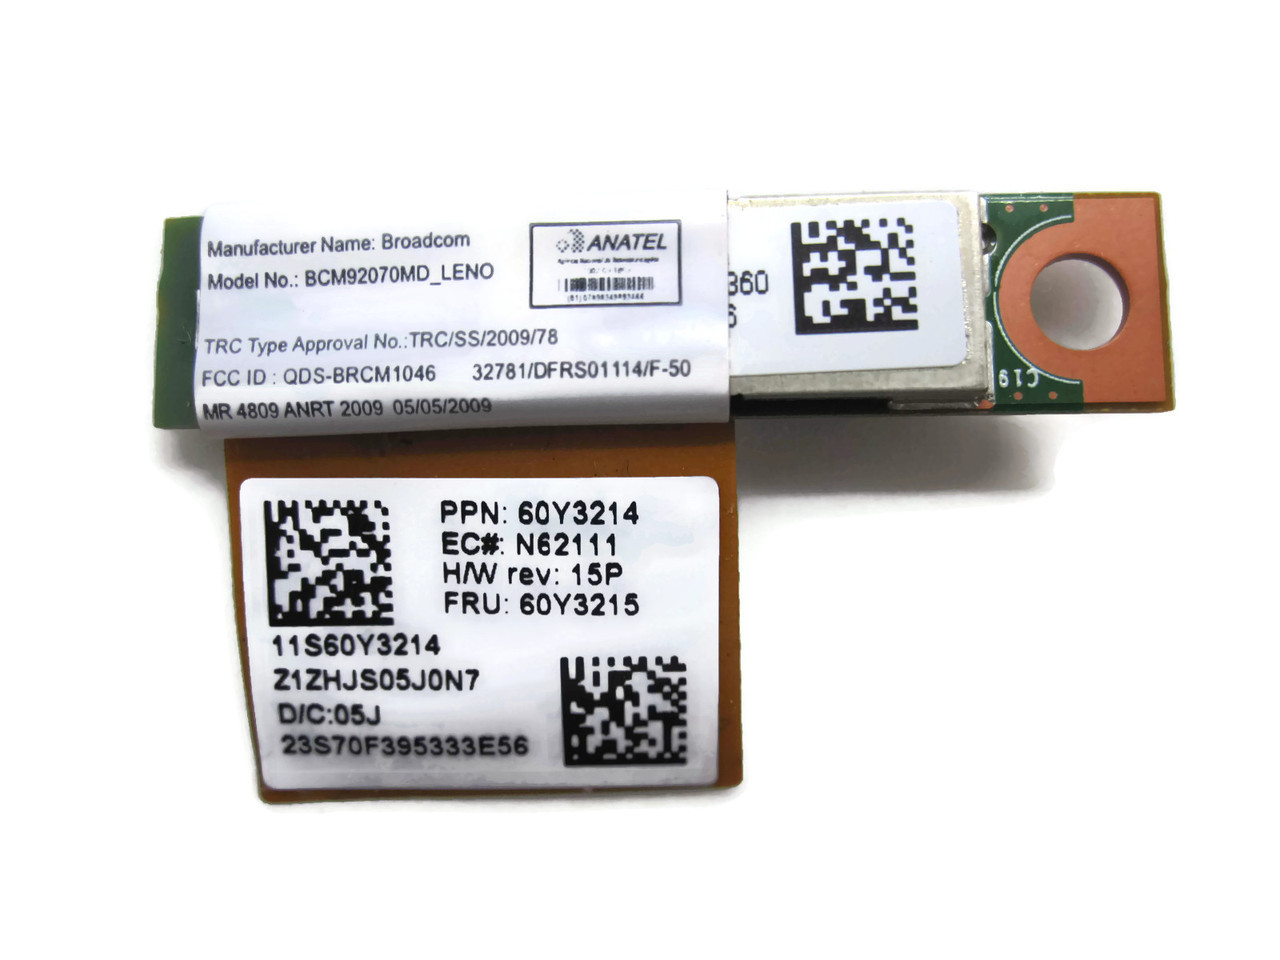 Lenovo ThinkPad X201i Broadcom Bluetooth X64 Driver Download